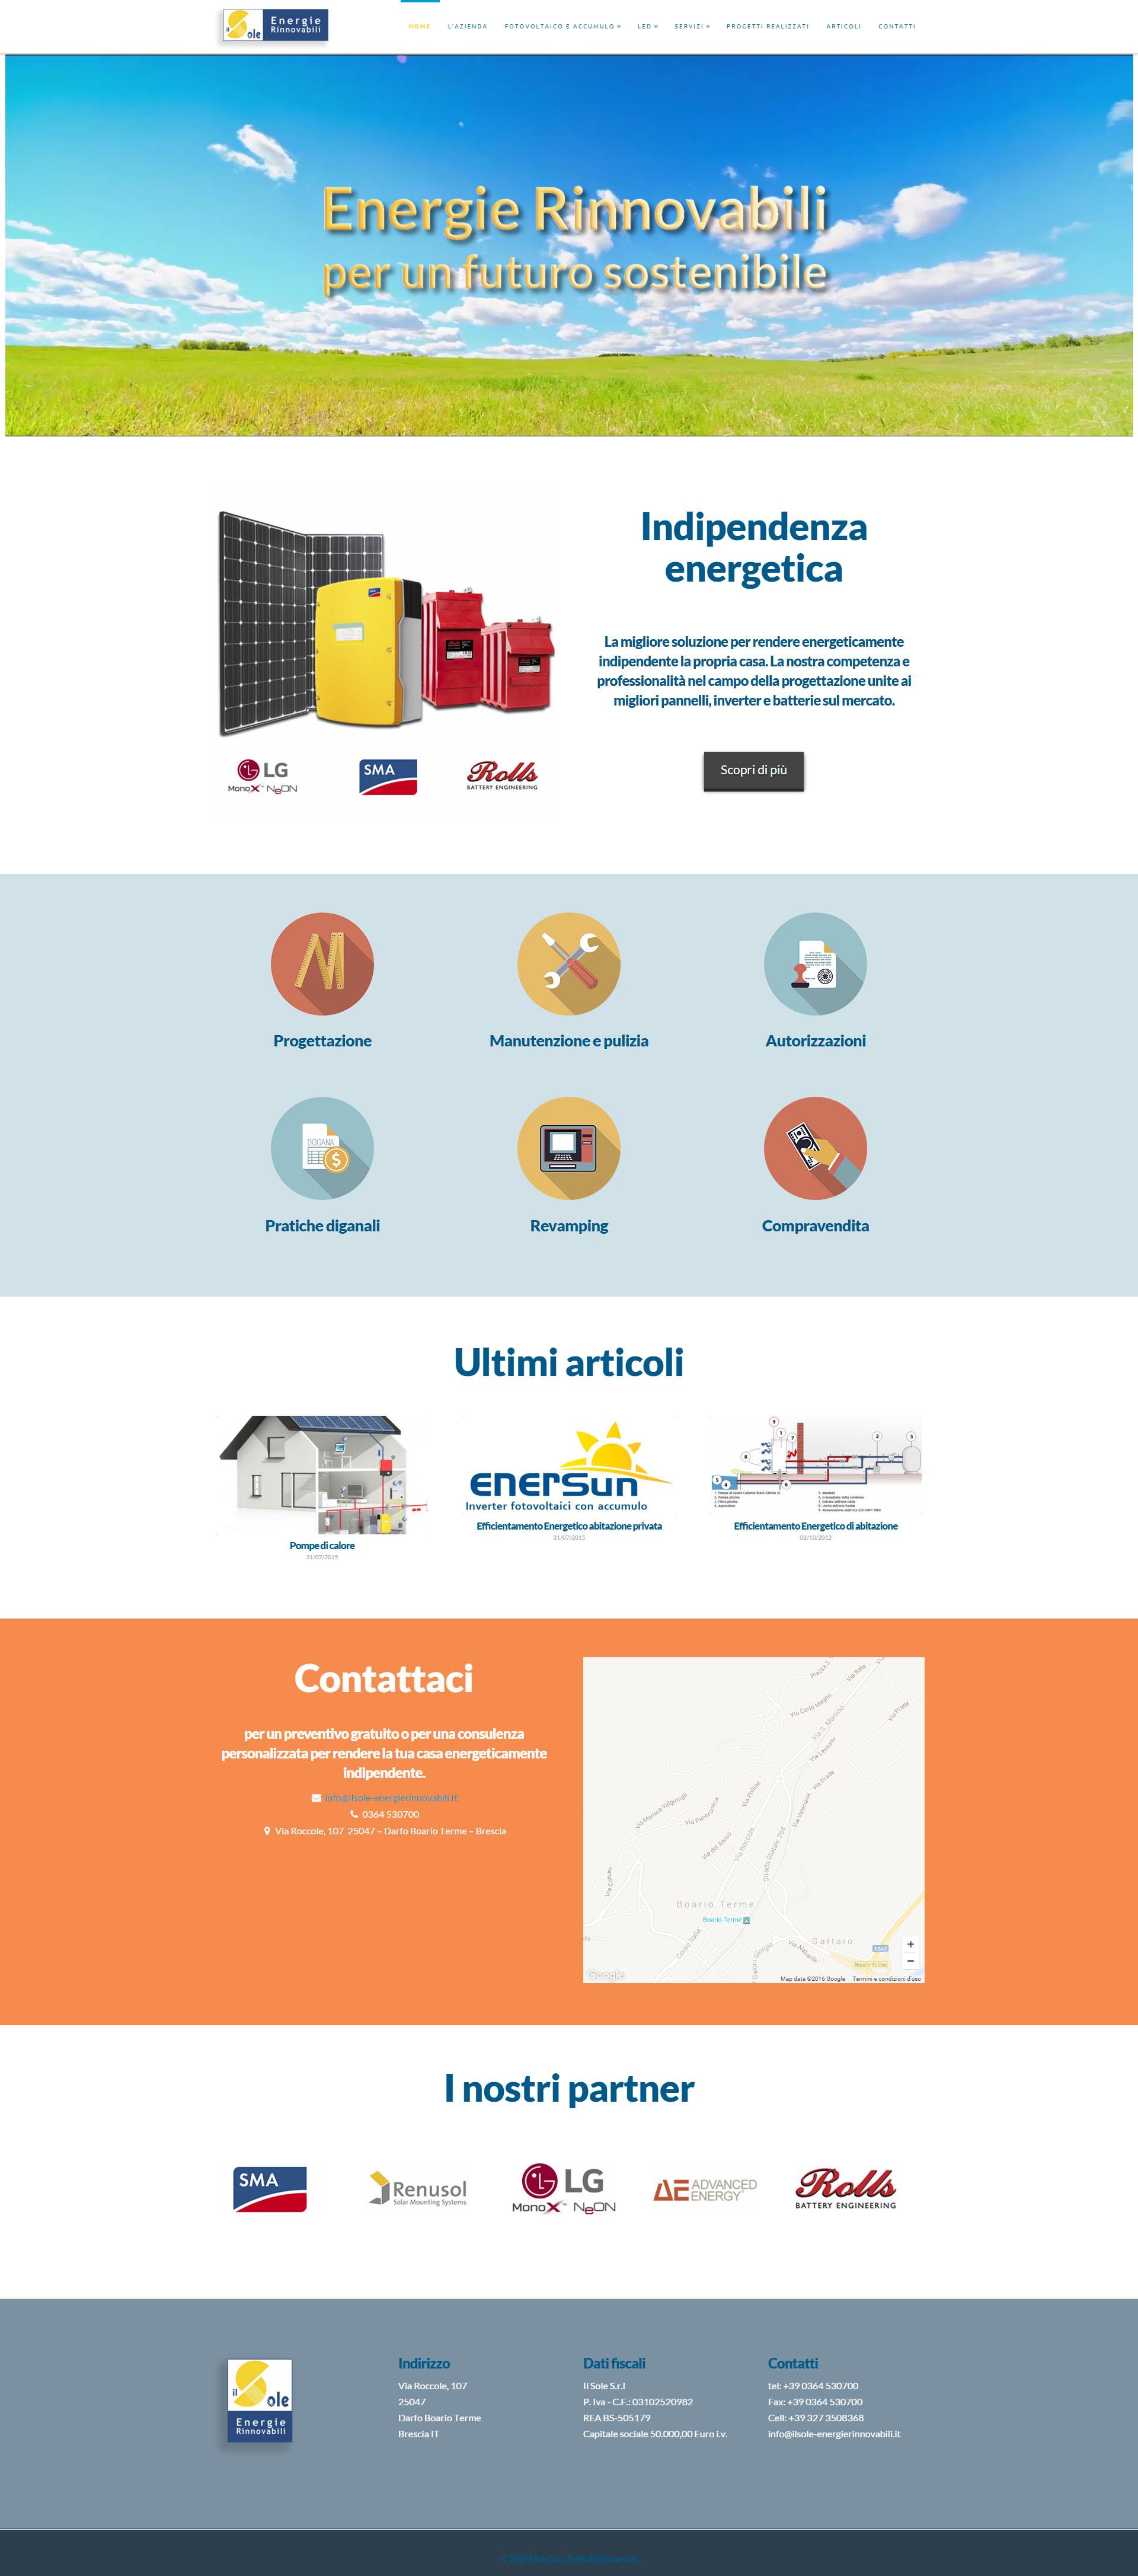 siti-internet-seo-newsletter-social-network-ol-sole-energie-rinnovabili--contessifostinelli